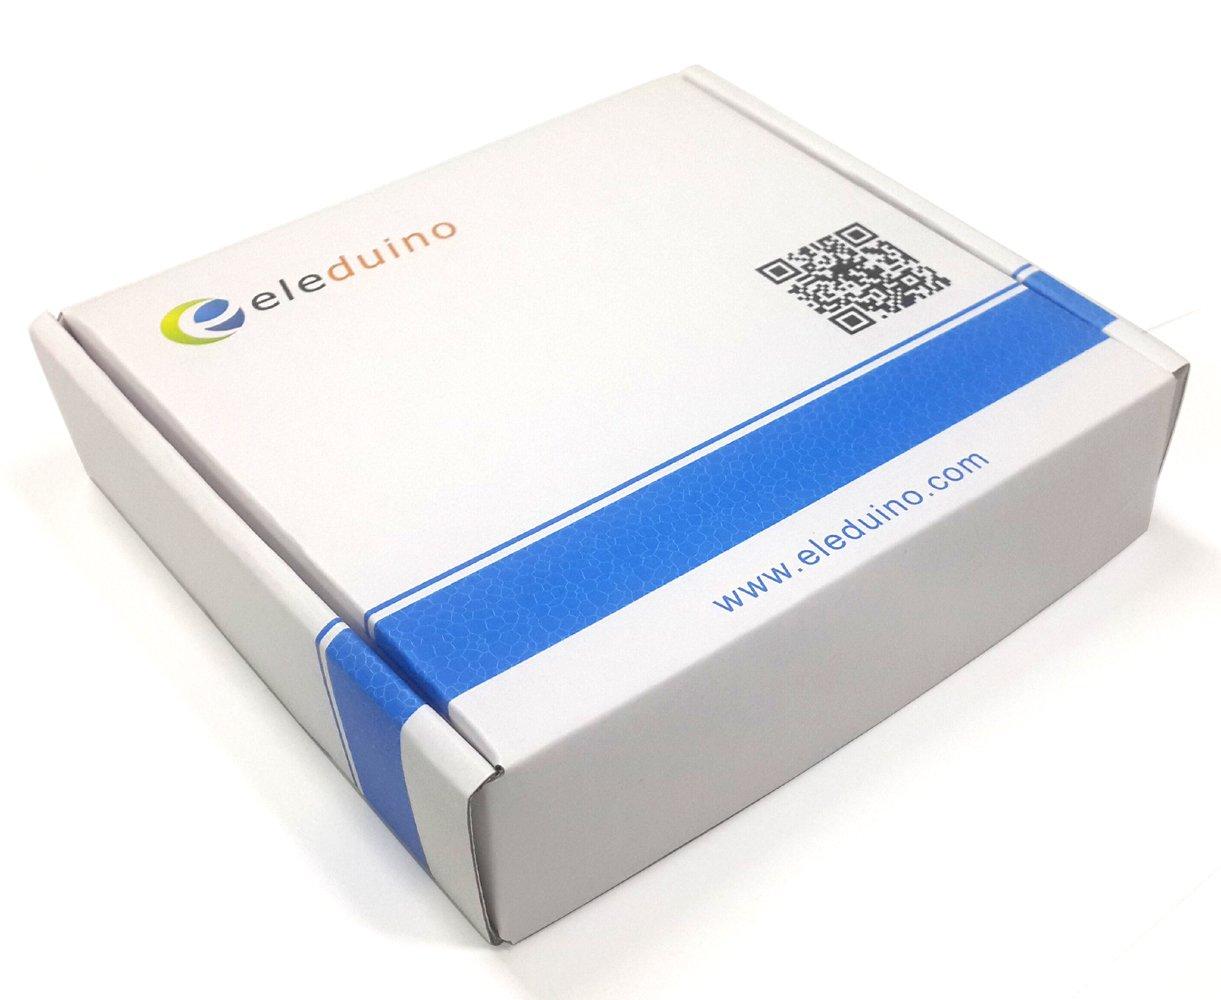 Eleduino Raspberry Pi 3 Aluminum Alloy Metal Case Blue and 5V 2.5A Power Supply Kit by EleDuino (Image #5)